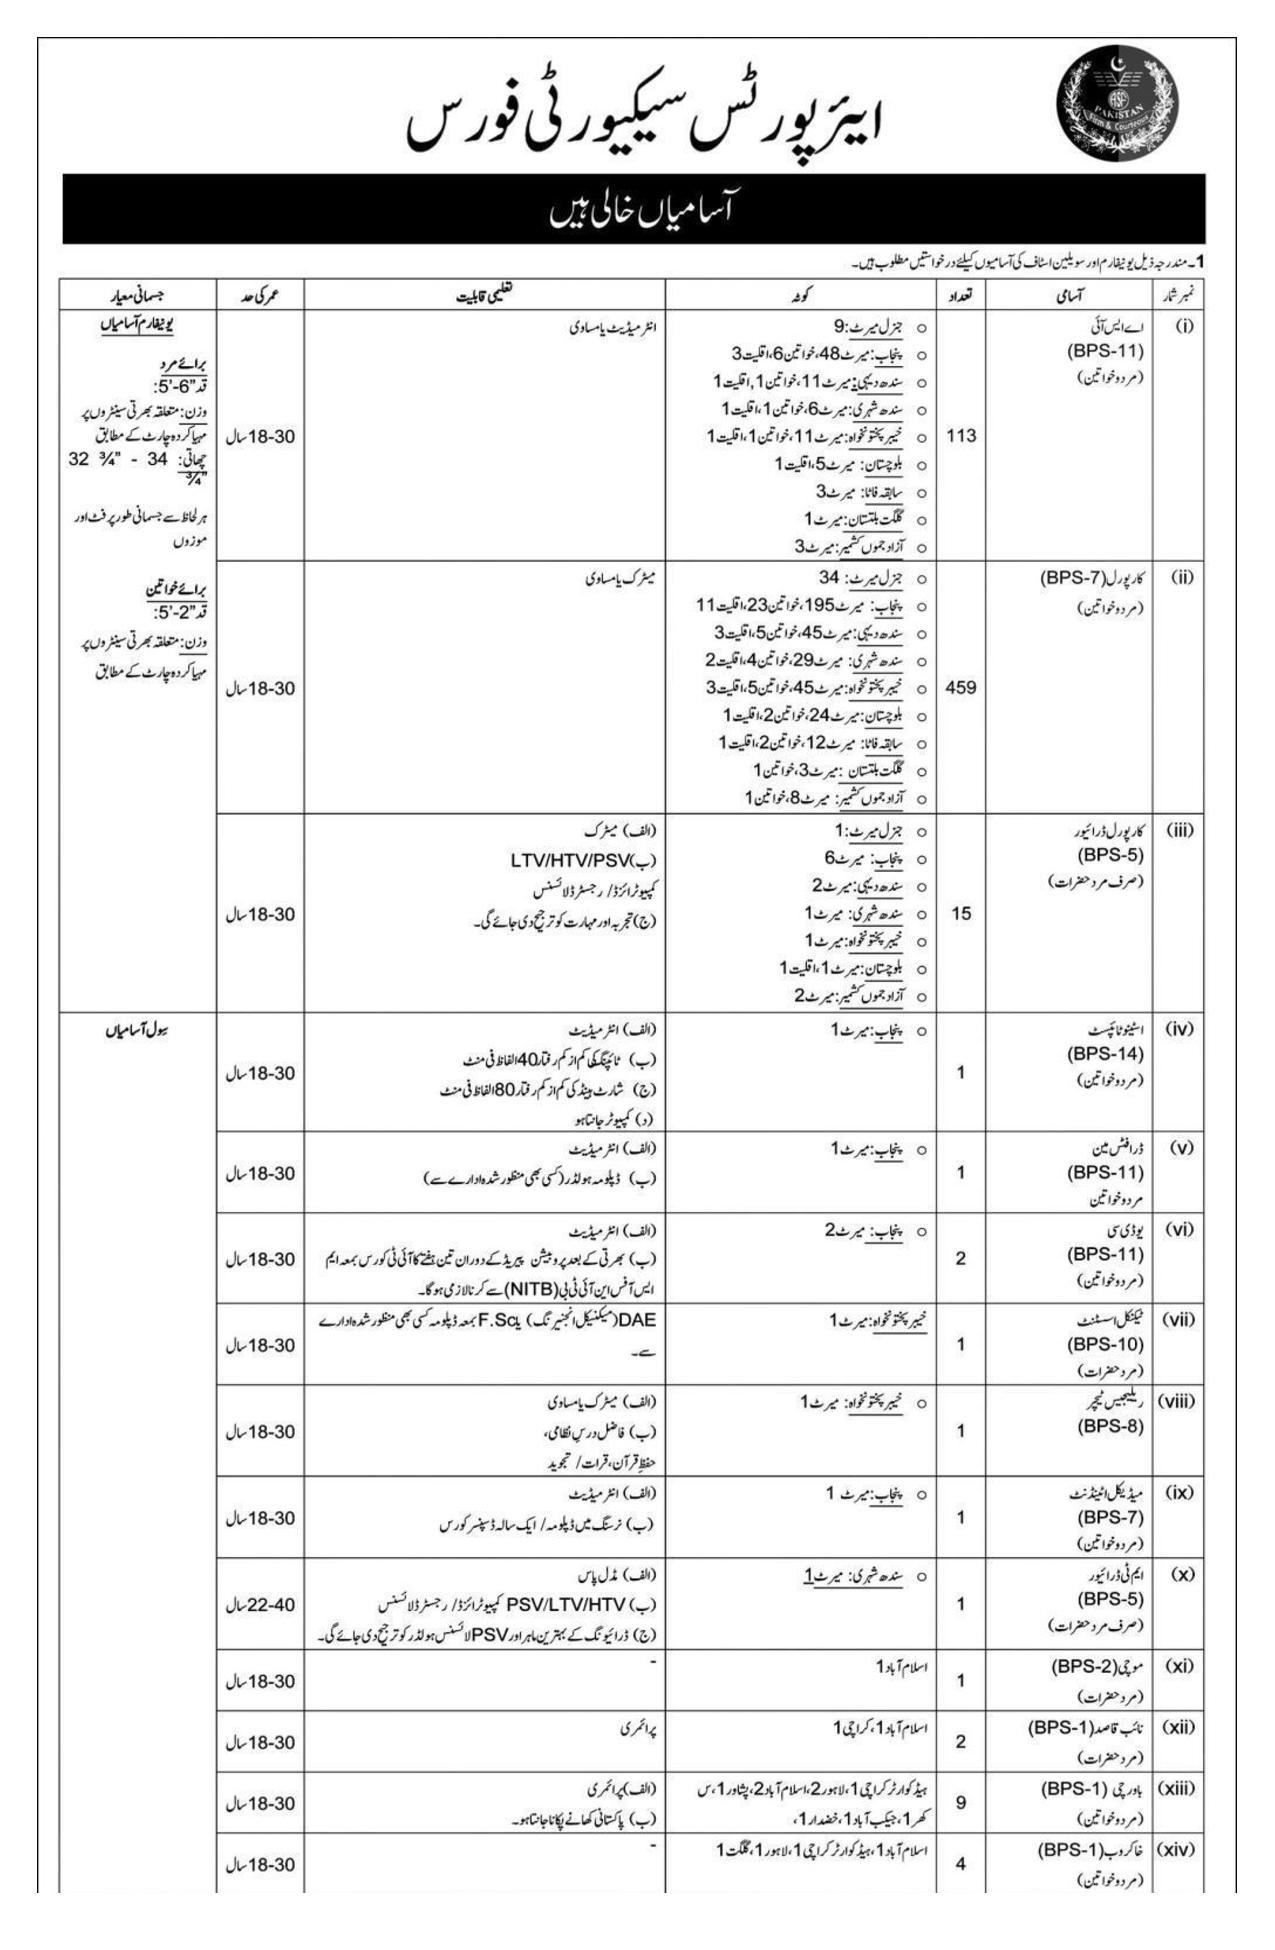 ASF Jobs Merit List